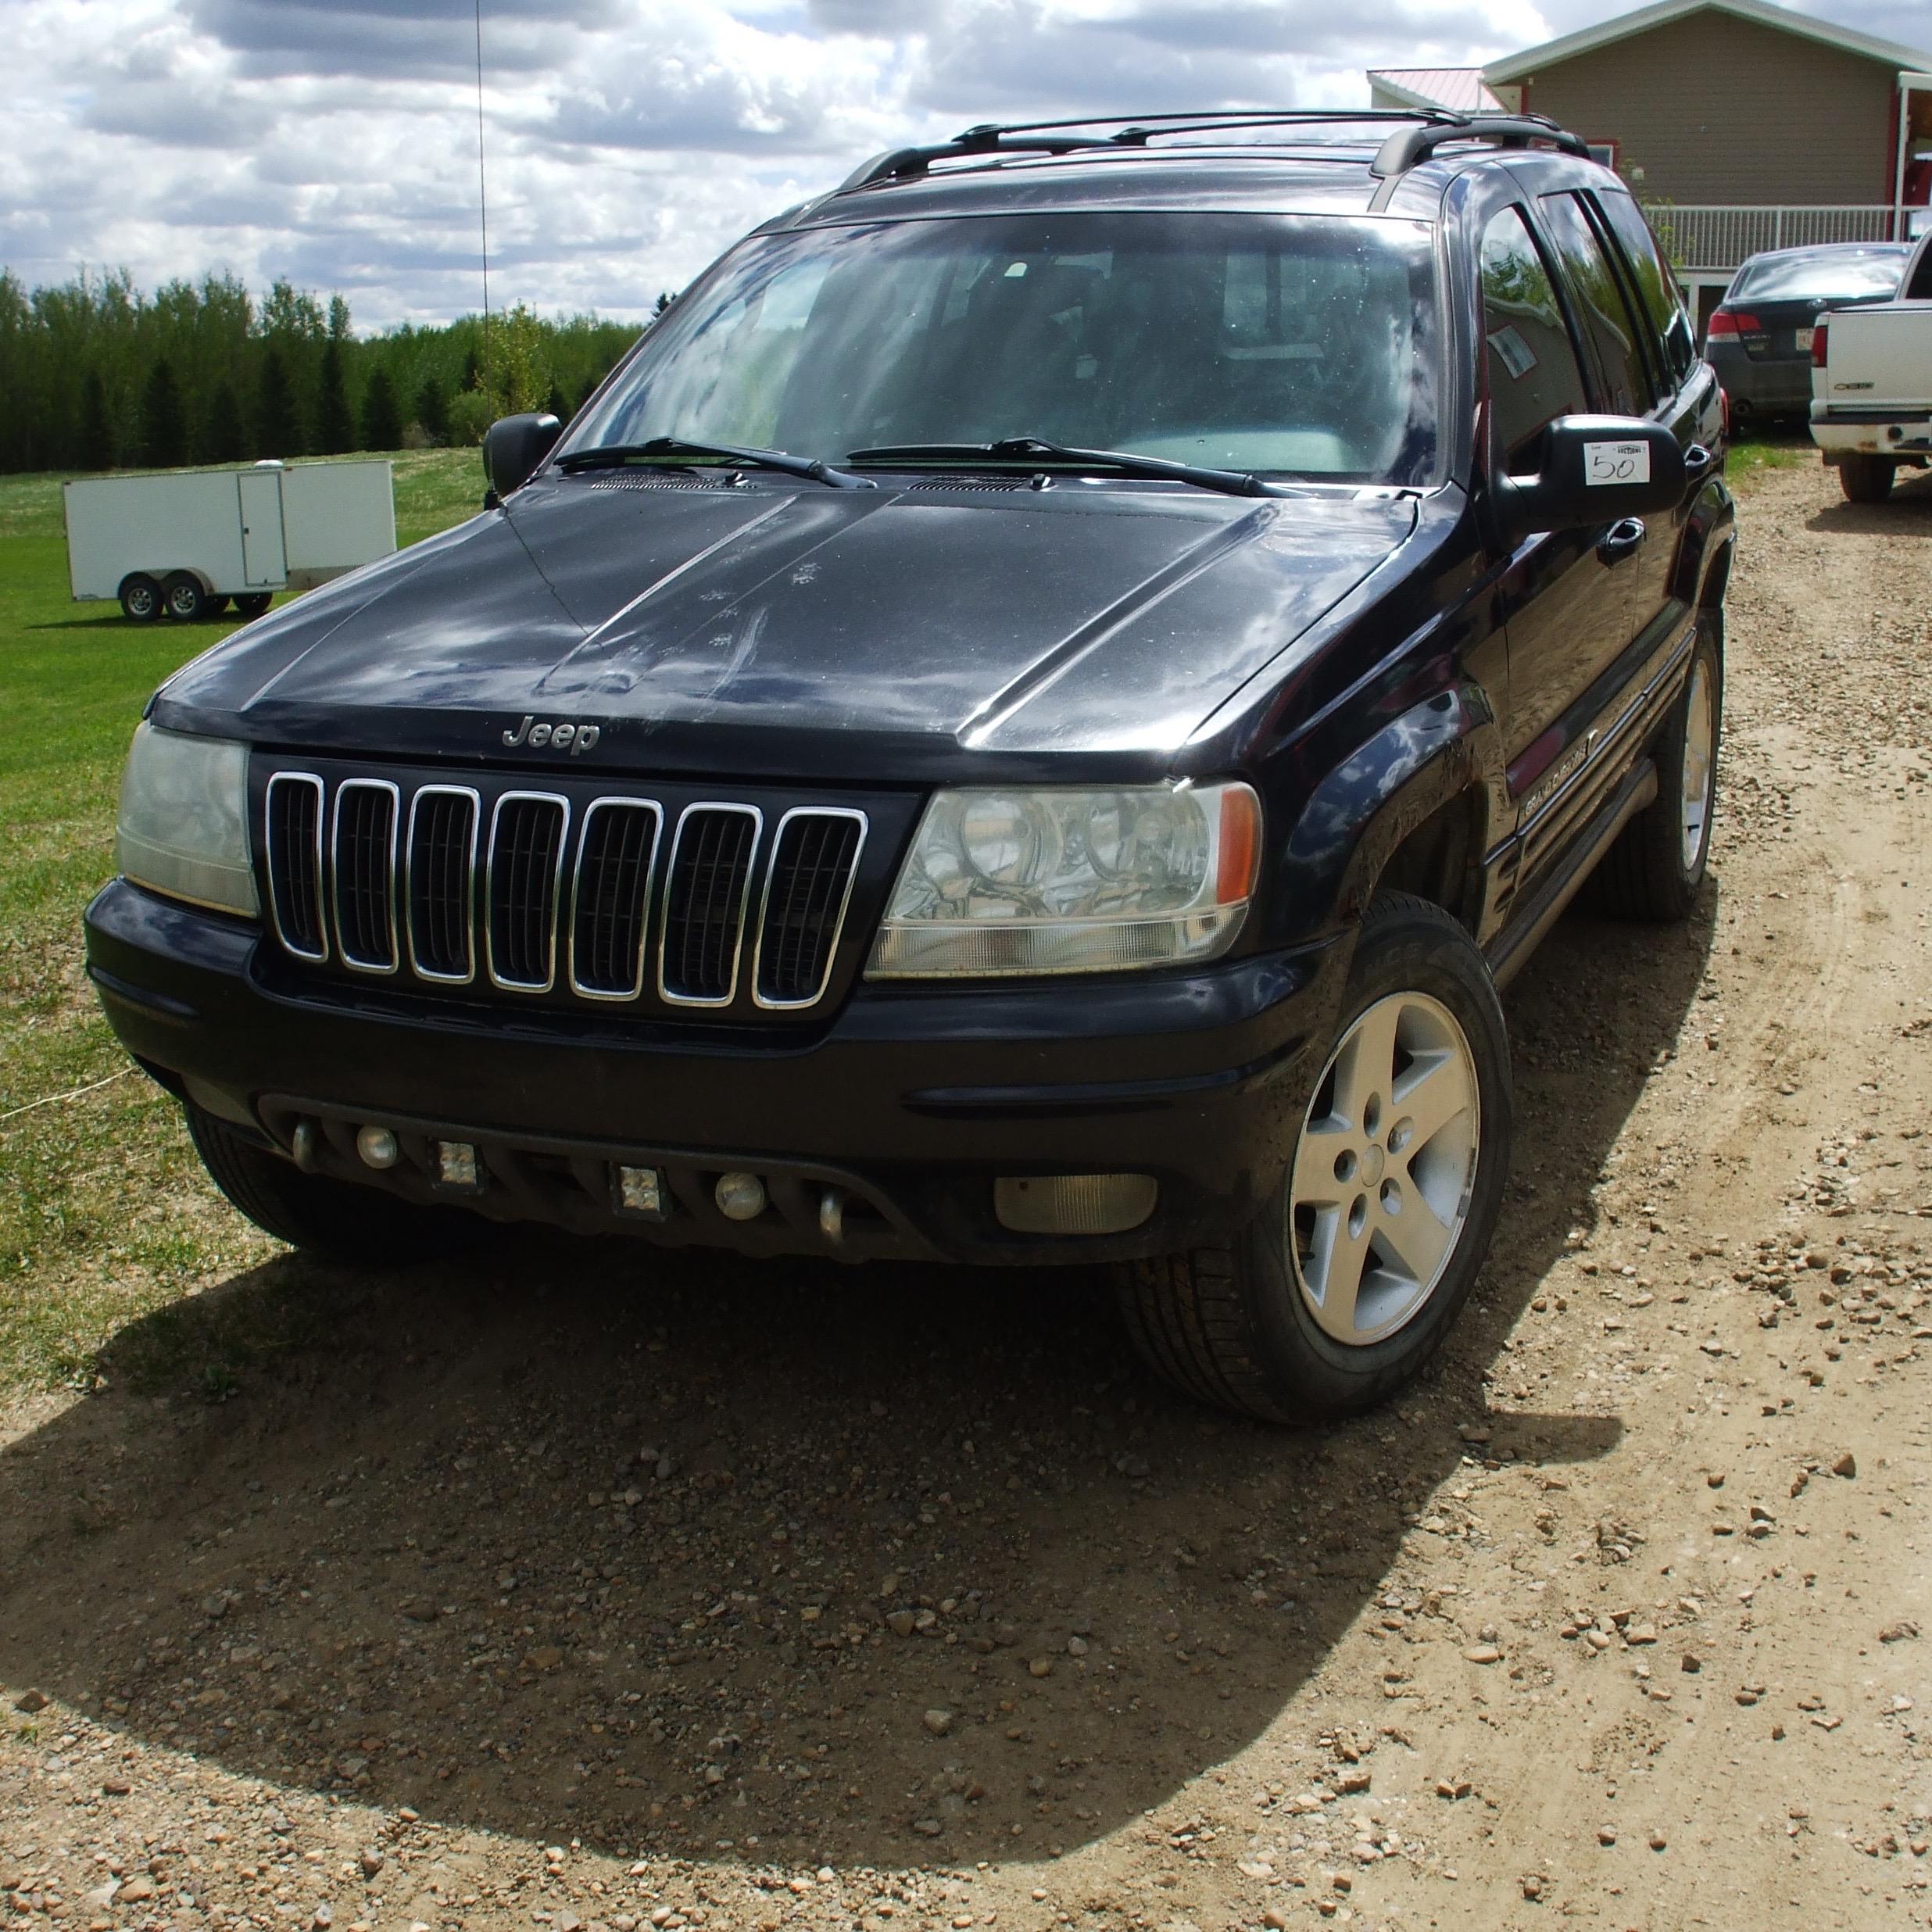 2002 Jeep, SUV ,black, 224,000 km sn: 1J8GW68J73C528479 - Image 4 of 6